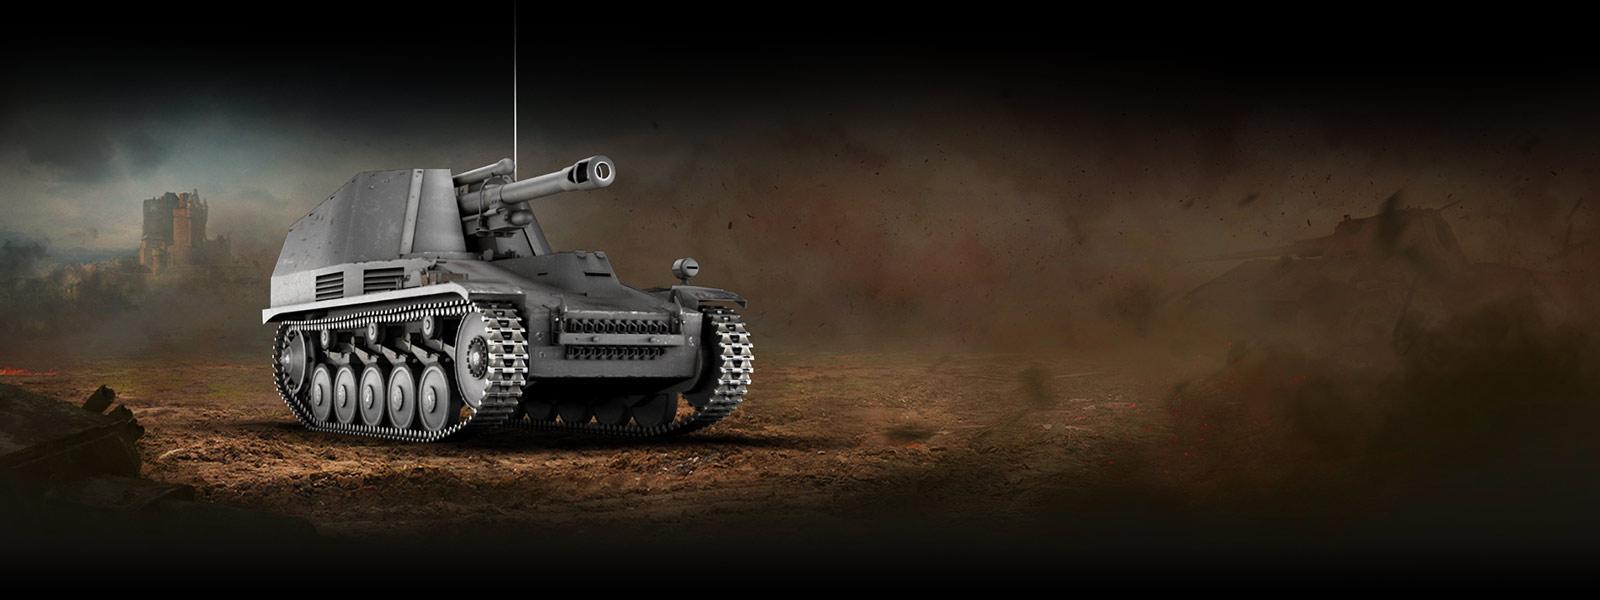 Tanque de artillería